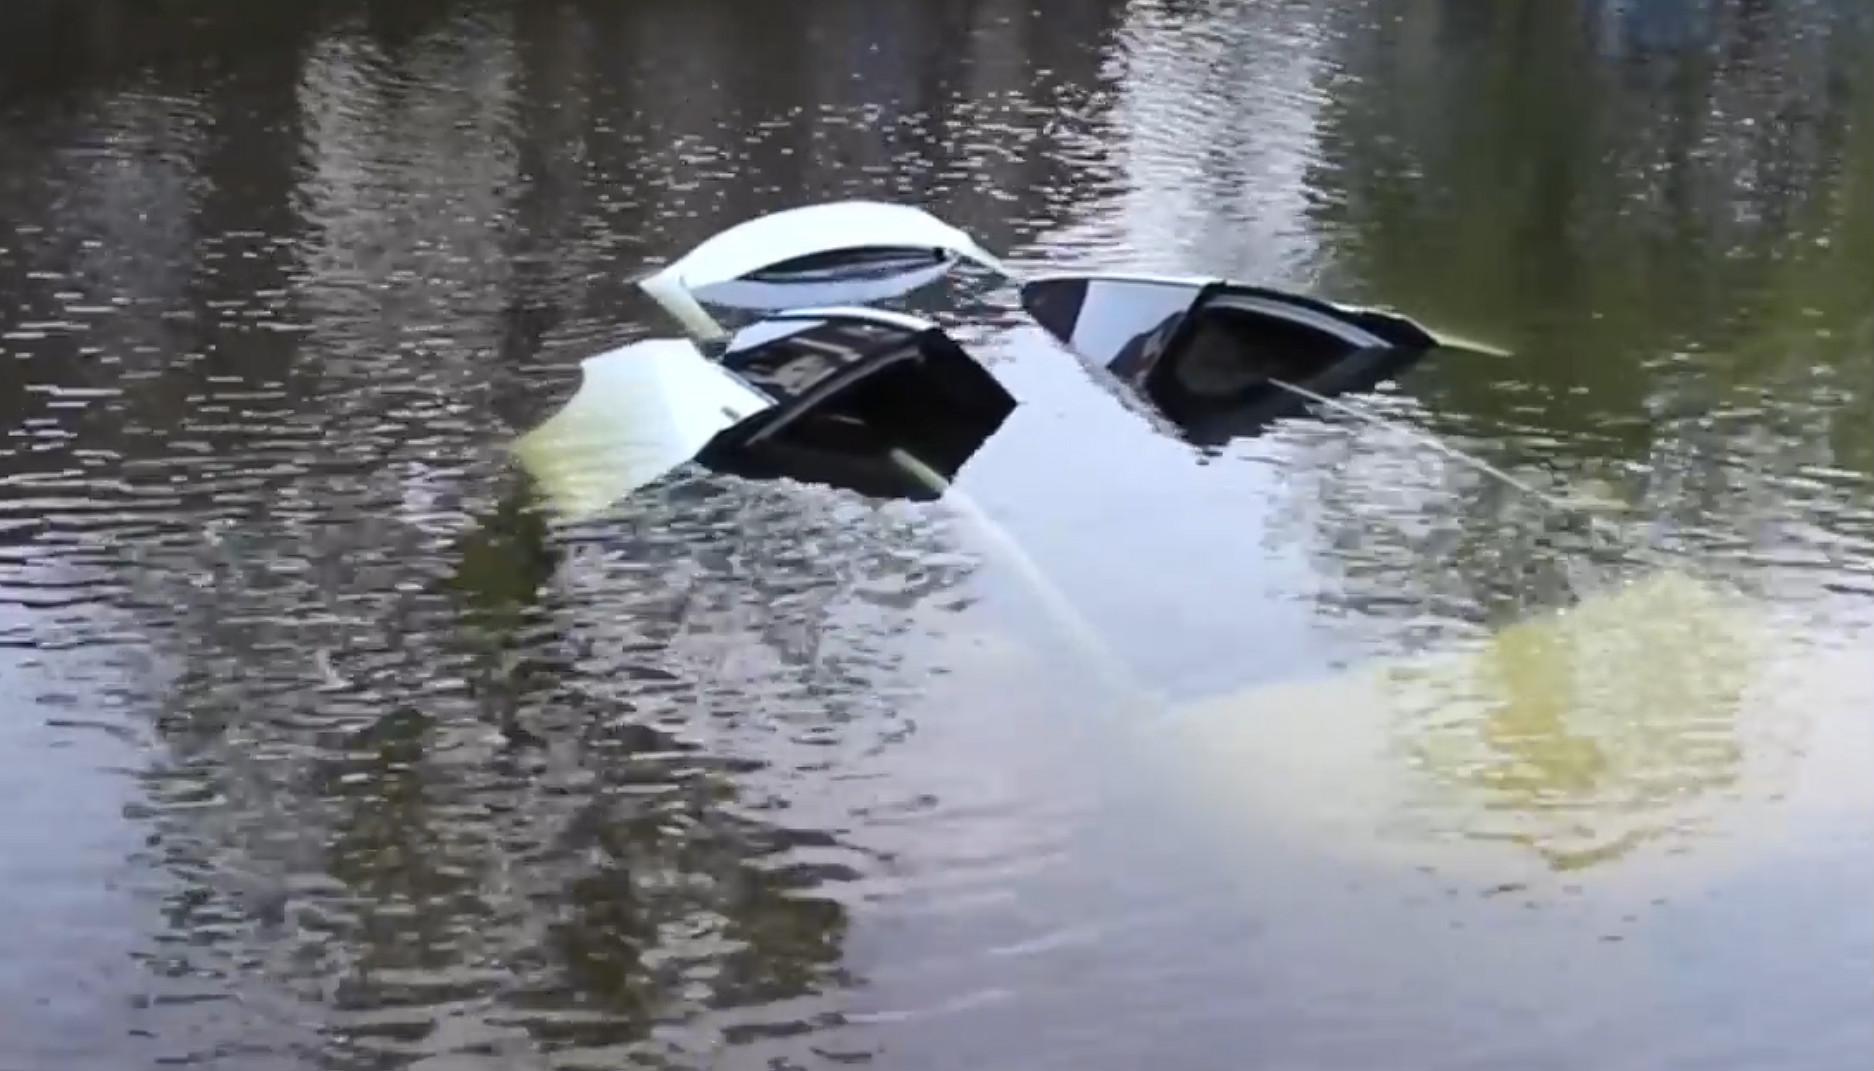 Model X sinks dutch canal 5 [Credit: Flashphoto NL/YouTube]